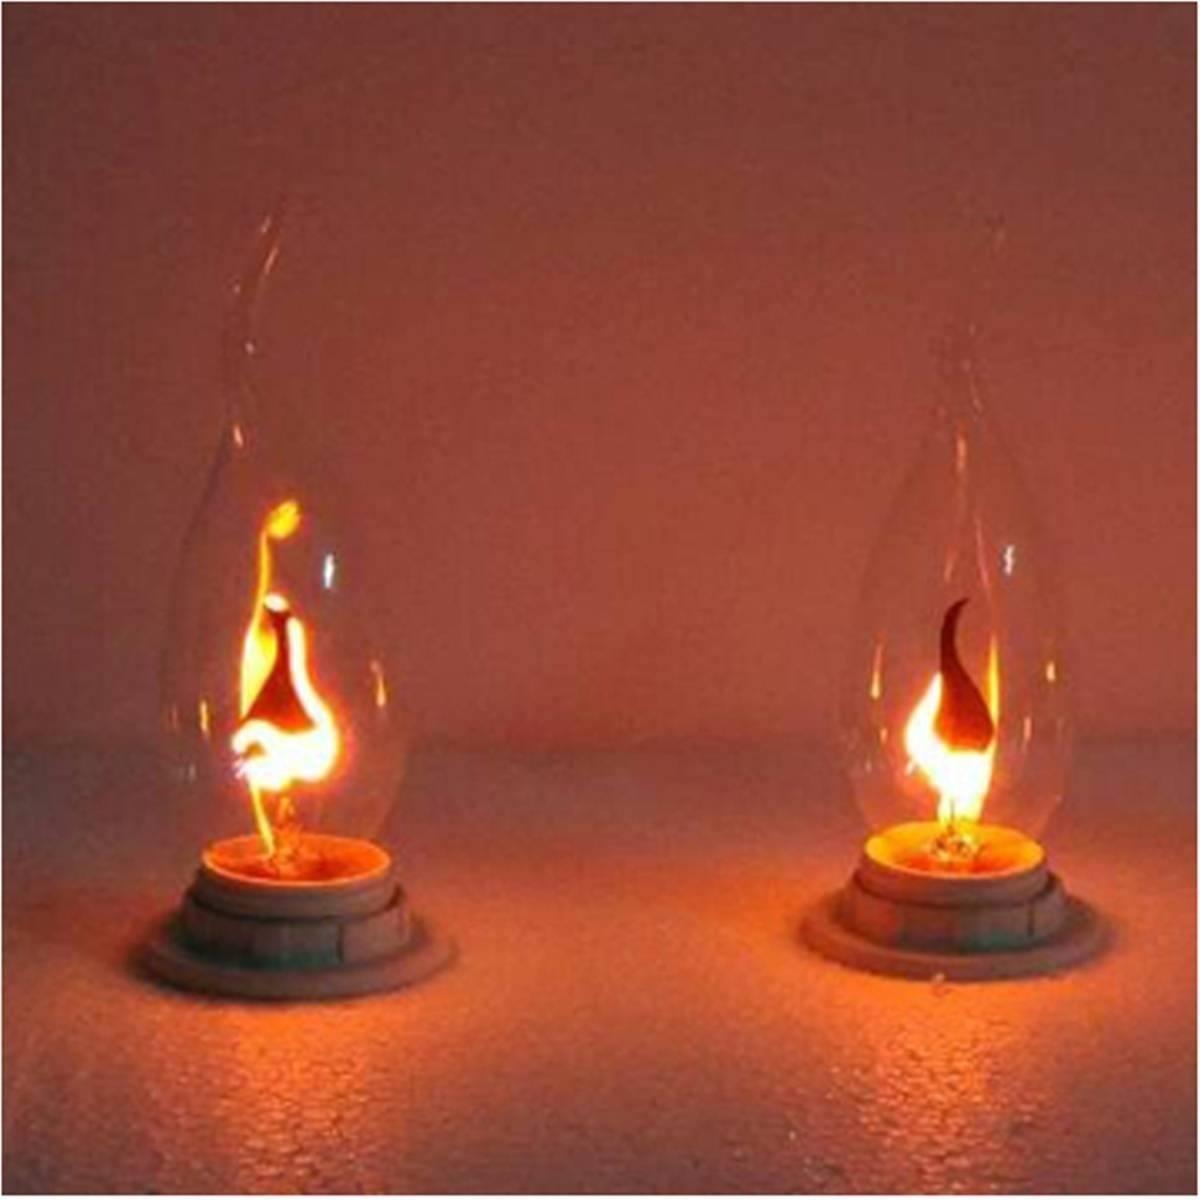 Flicker bulbs